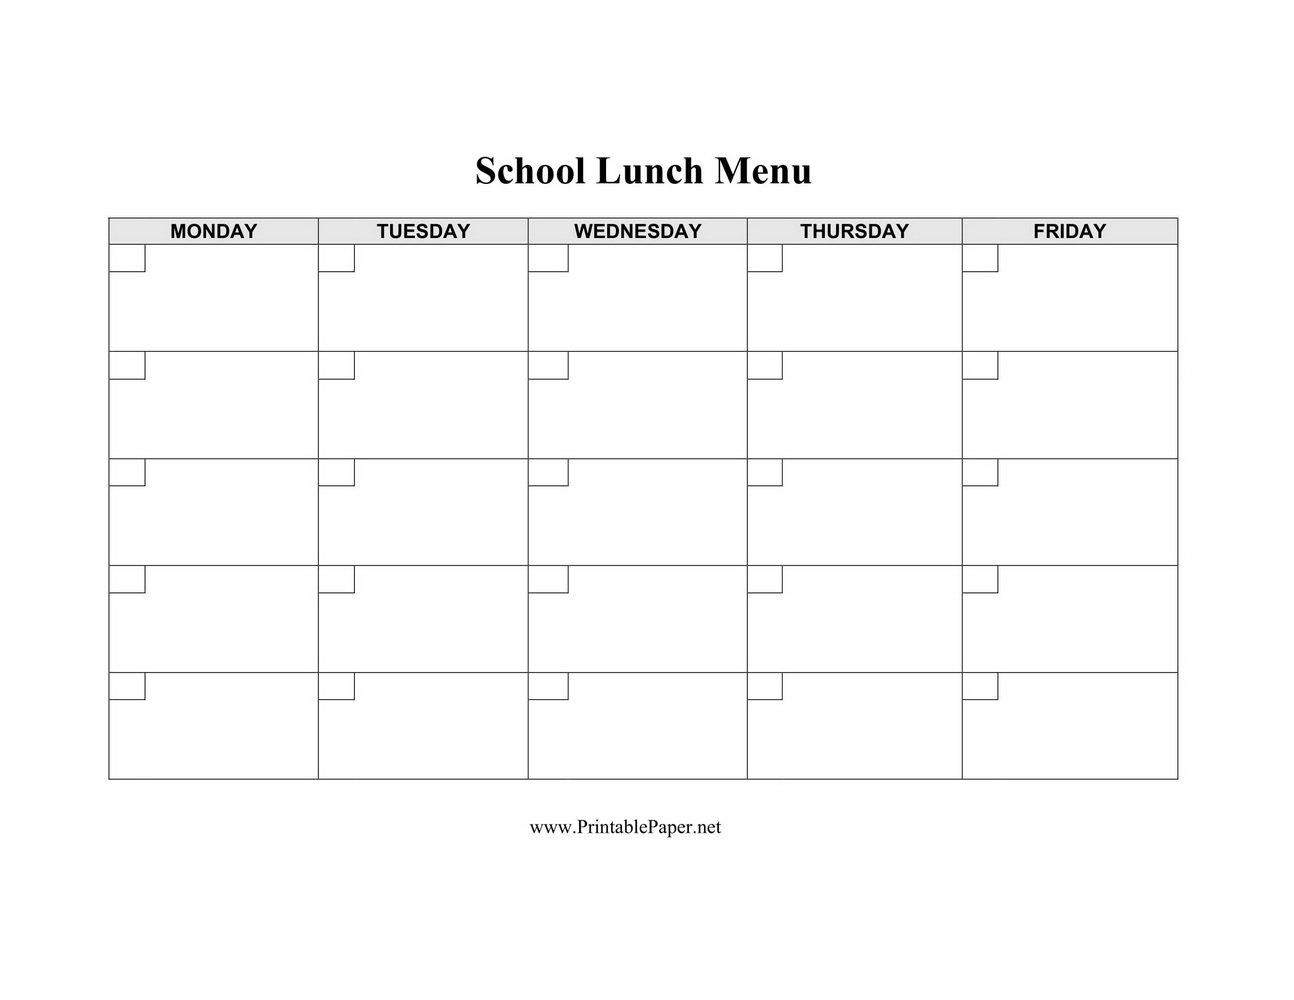 Sample School Lunch Menu Template